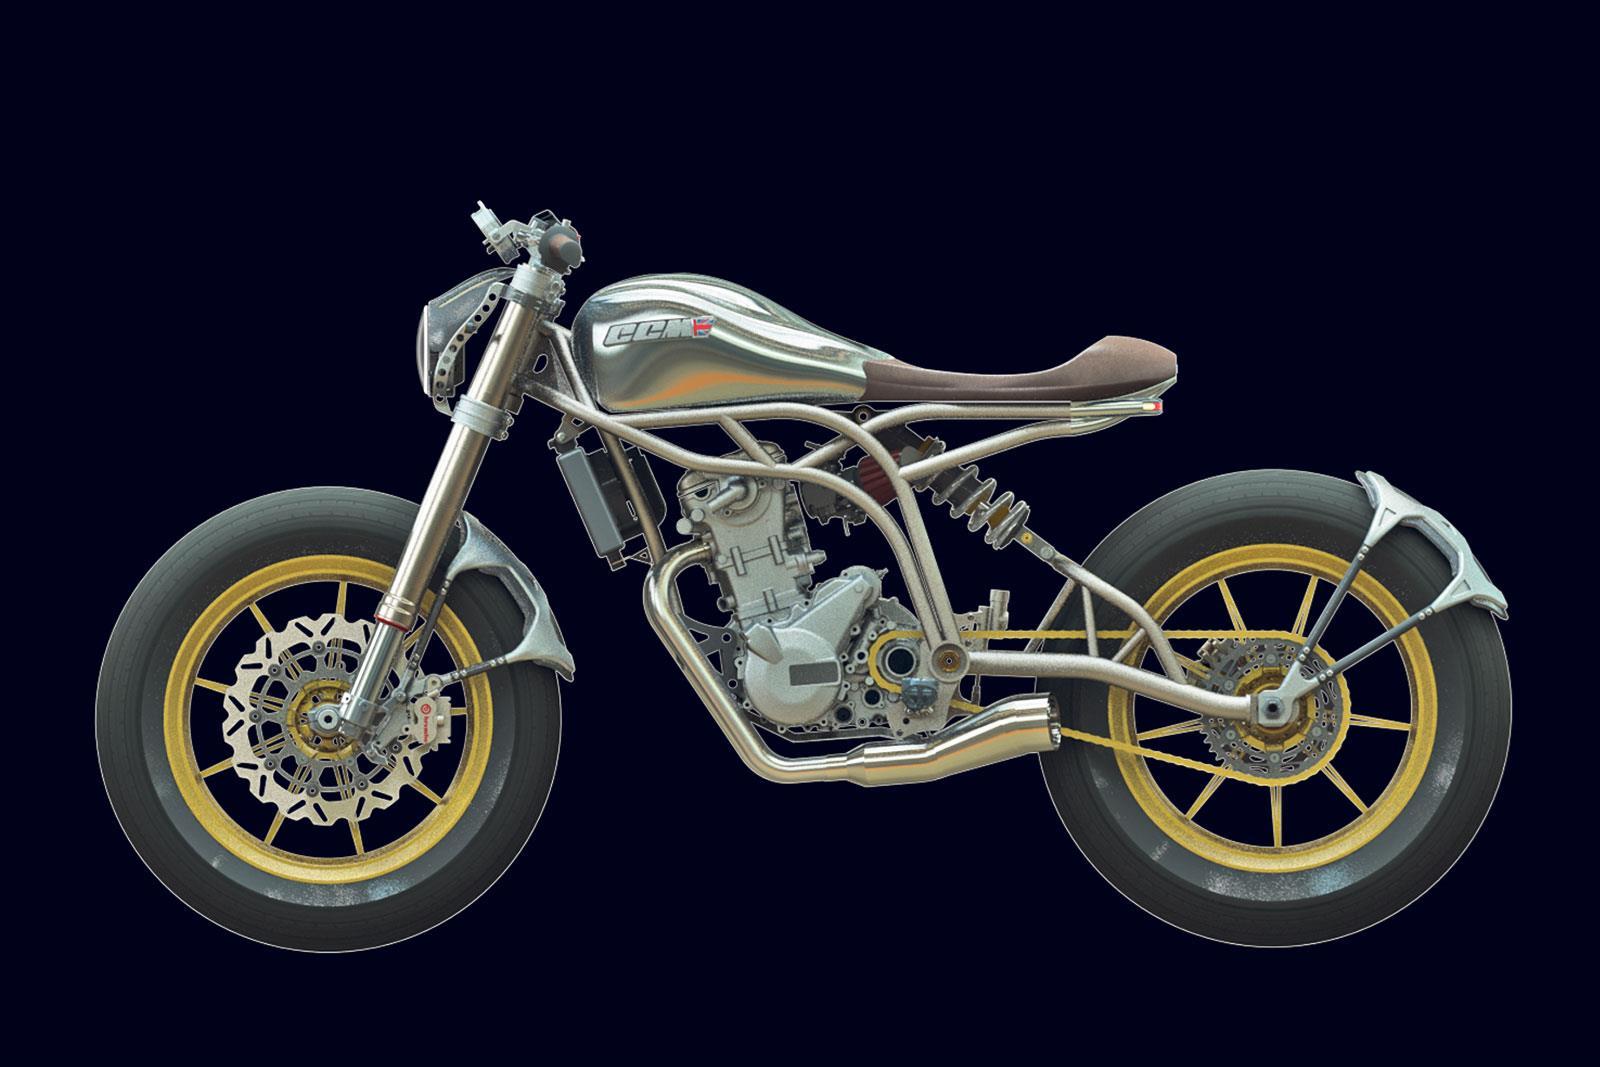 Carole Nash Bike Insurance >> CCM plan new Spitfire Scrambler